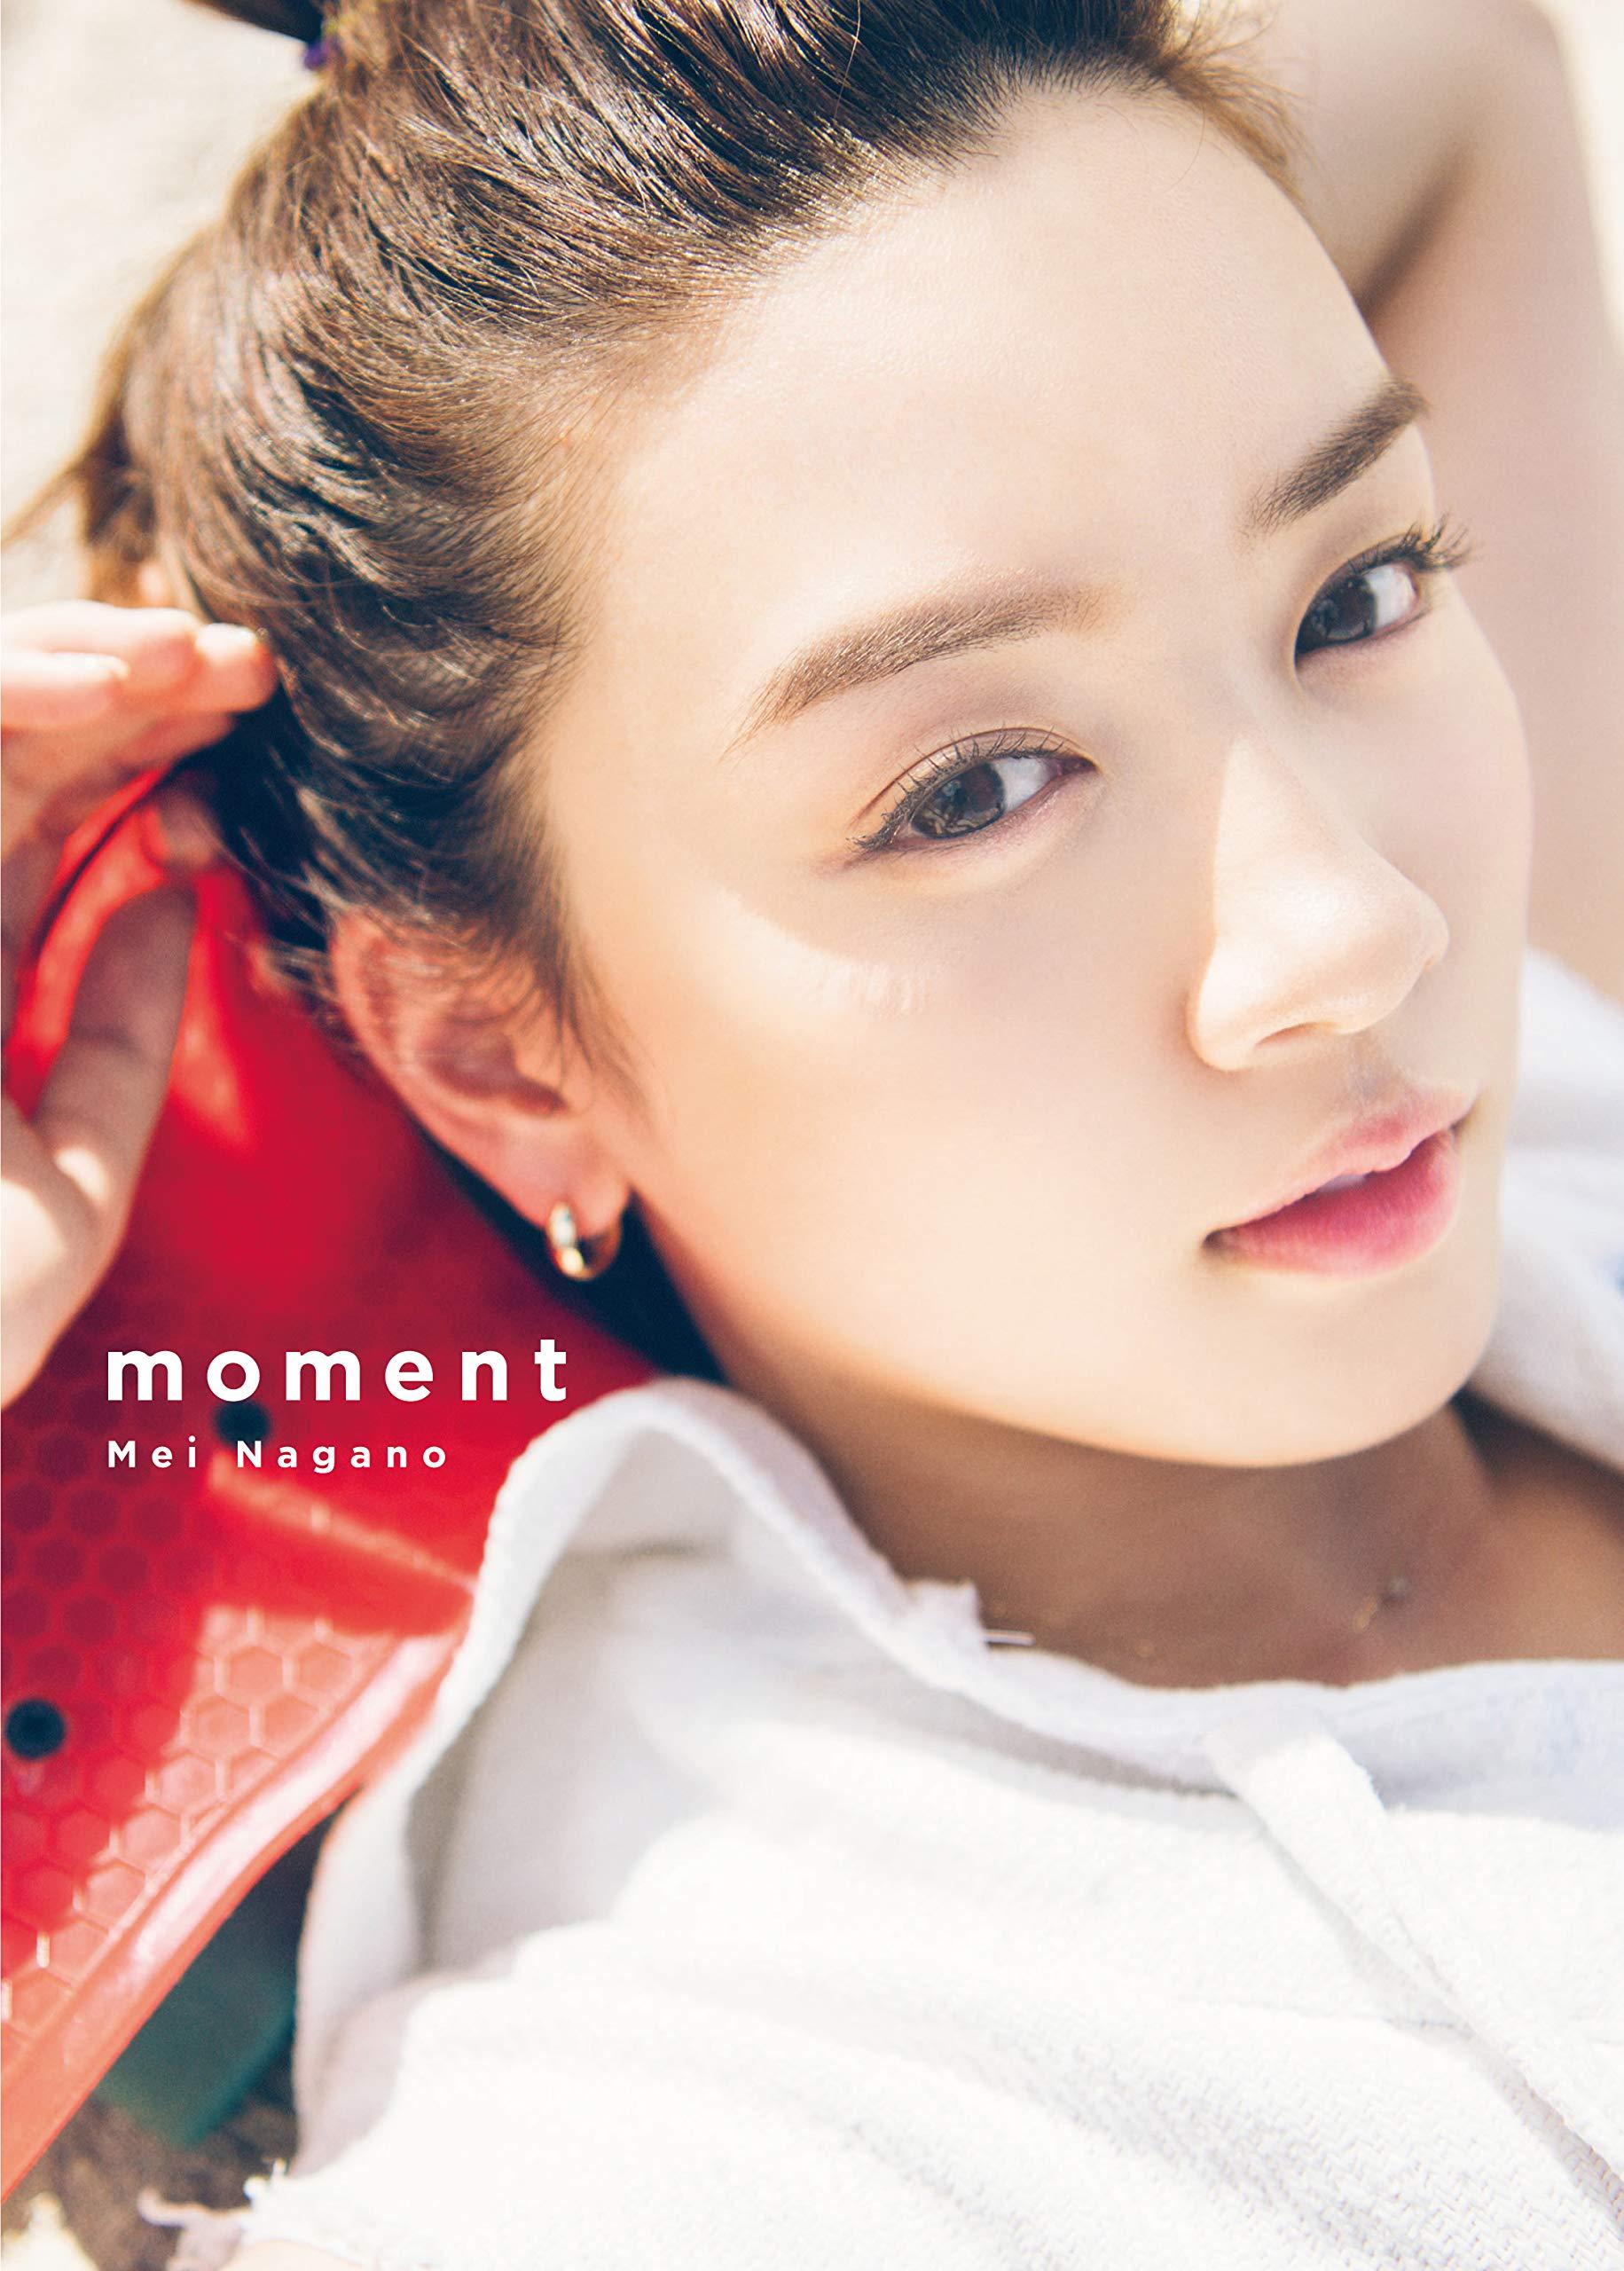 Japanese Actress Mei Nagano First Photo Book Moment 永野芽郁